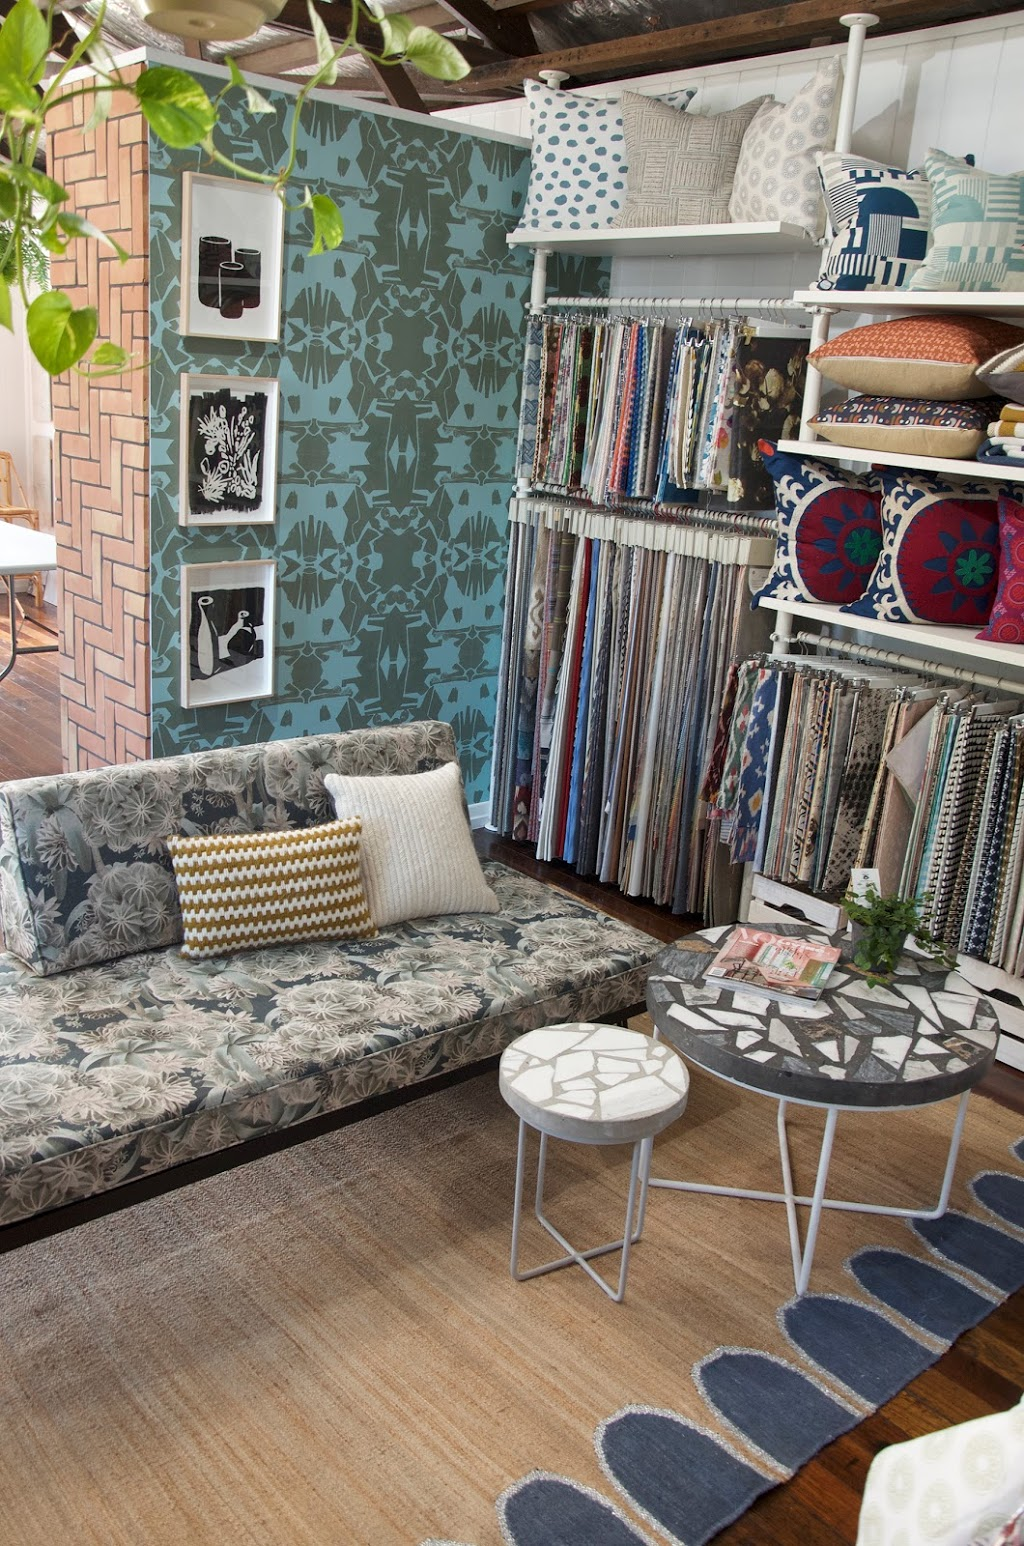 Style Revolutionary | home goods store | 1/31 Chorlton St, East Brisbane QLD 4169, Australia | 0418989838 OR +61 418 989 838